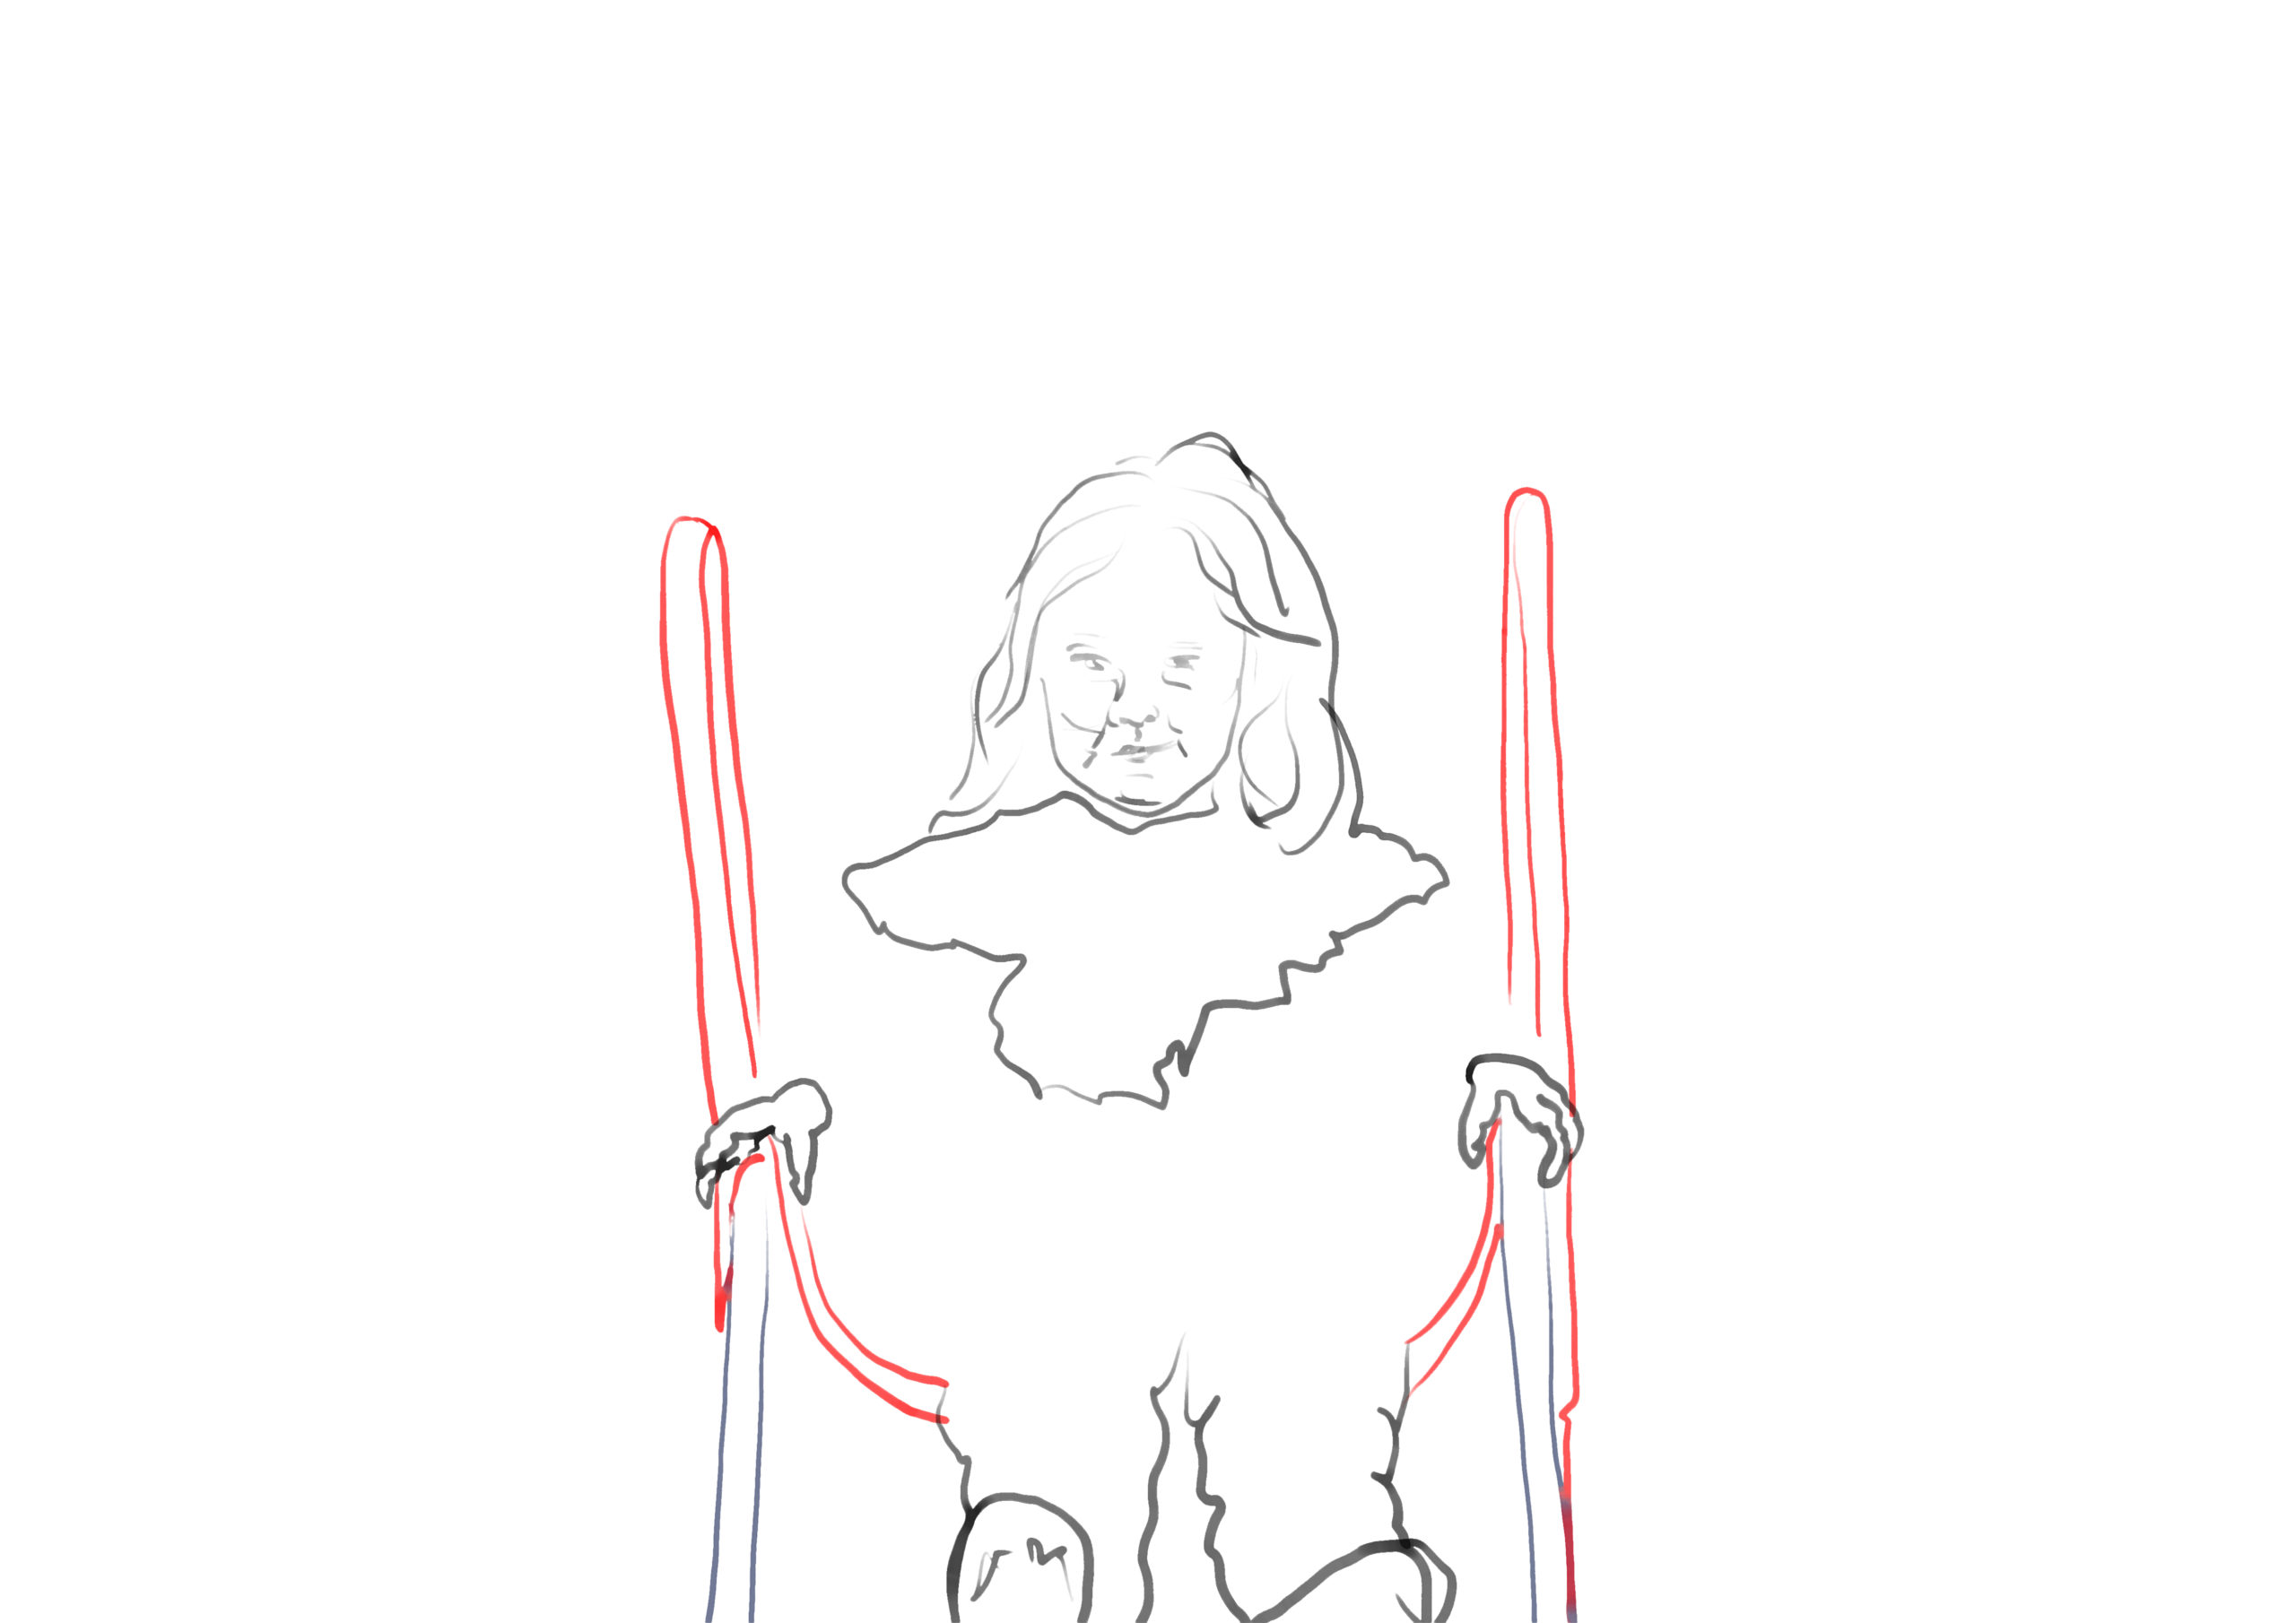 Ariane Karwotka, nanie trohnt, digitale Zeichnung/ pc-print, 42 x 29,7 cm, 2020